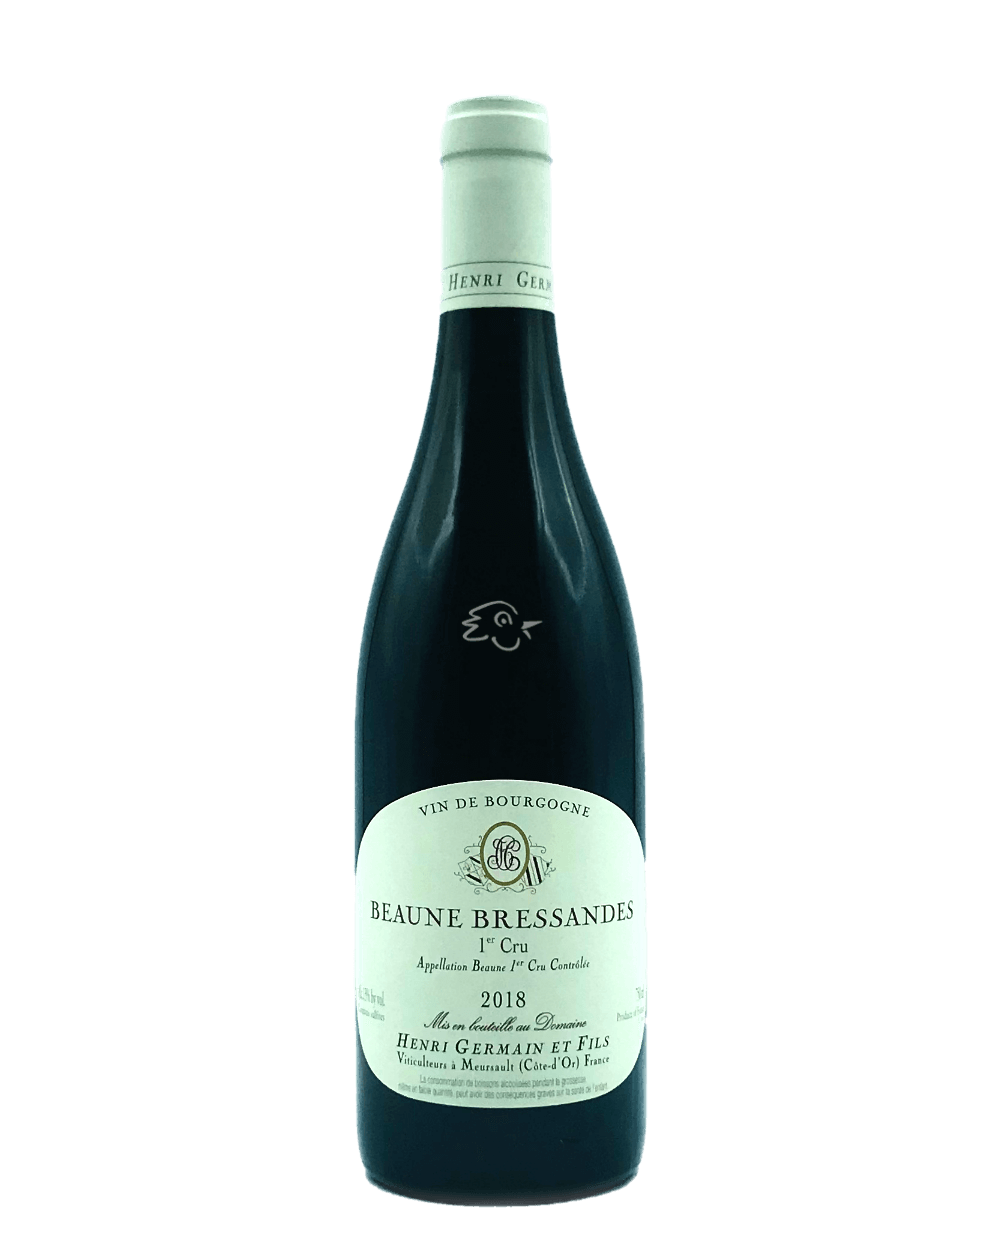 Domaine Henri Germain & Fils - Beaune Bressandes 1er Cru 2018 - Avintures